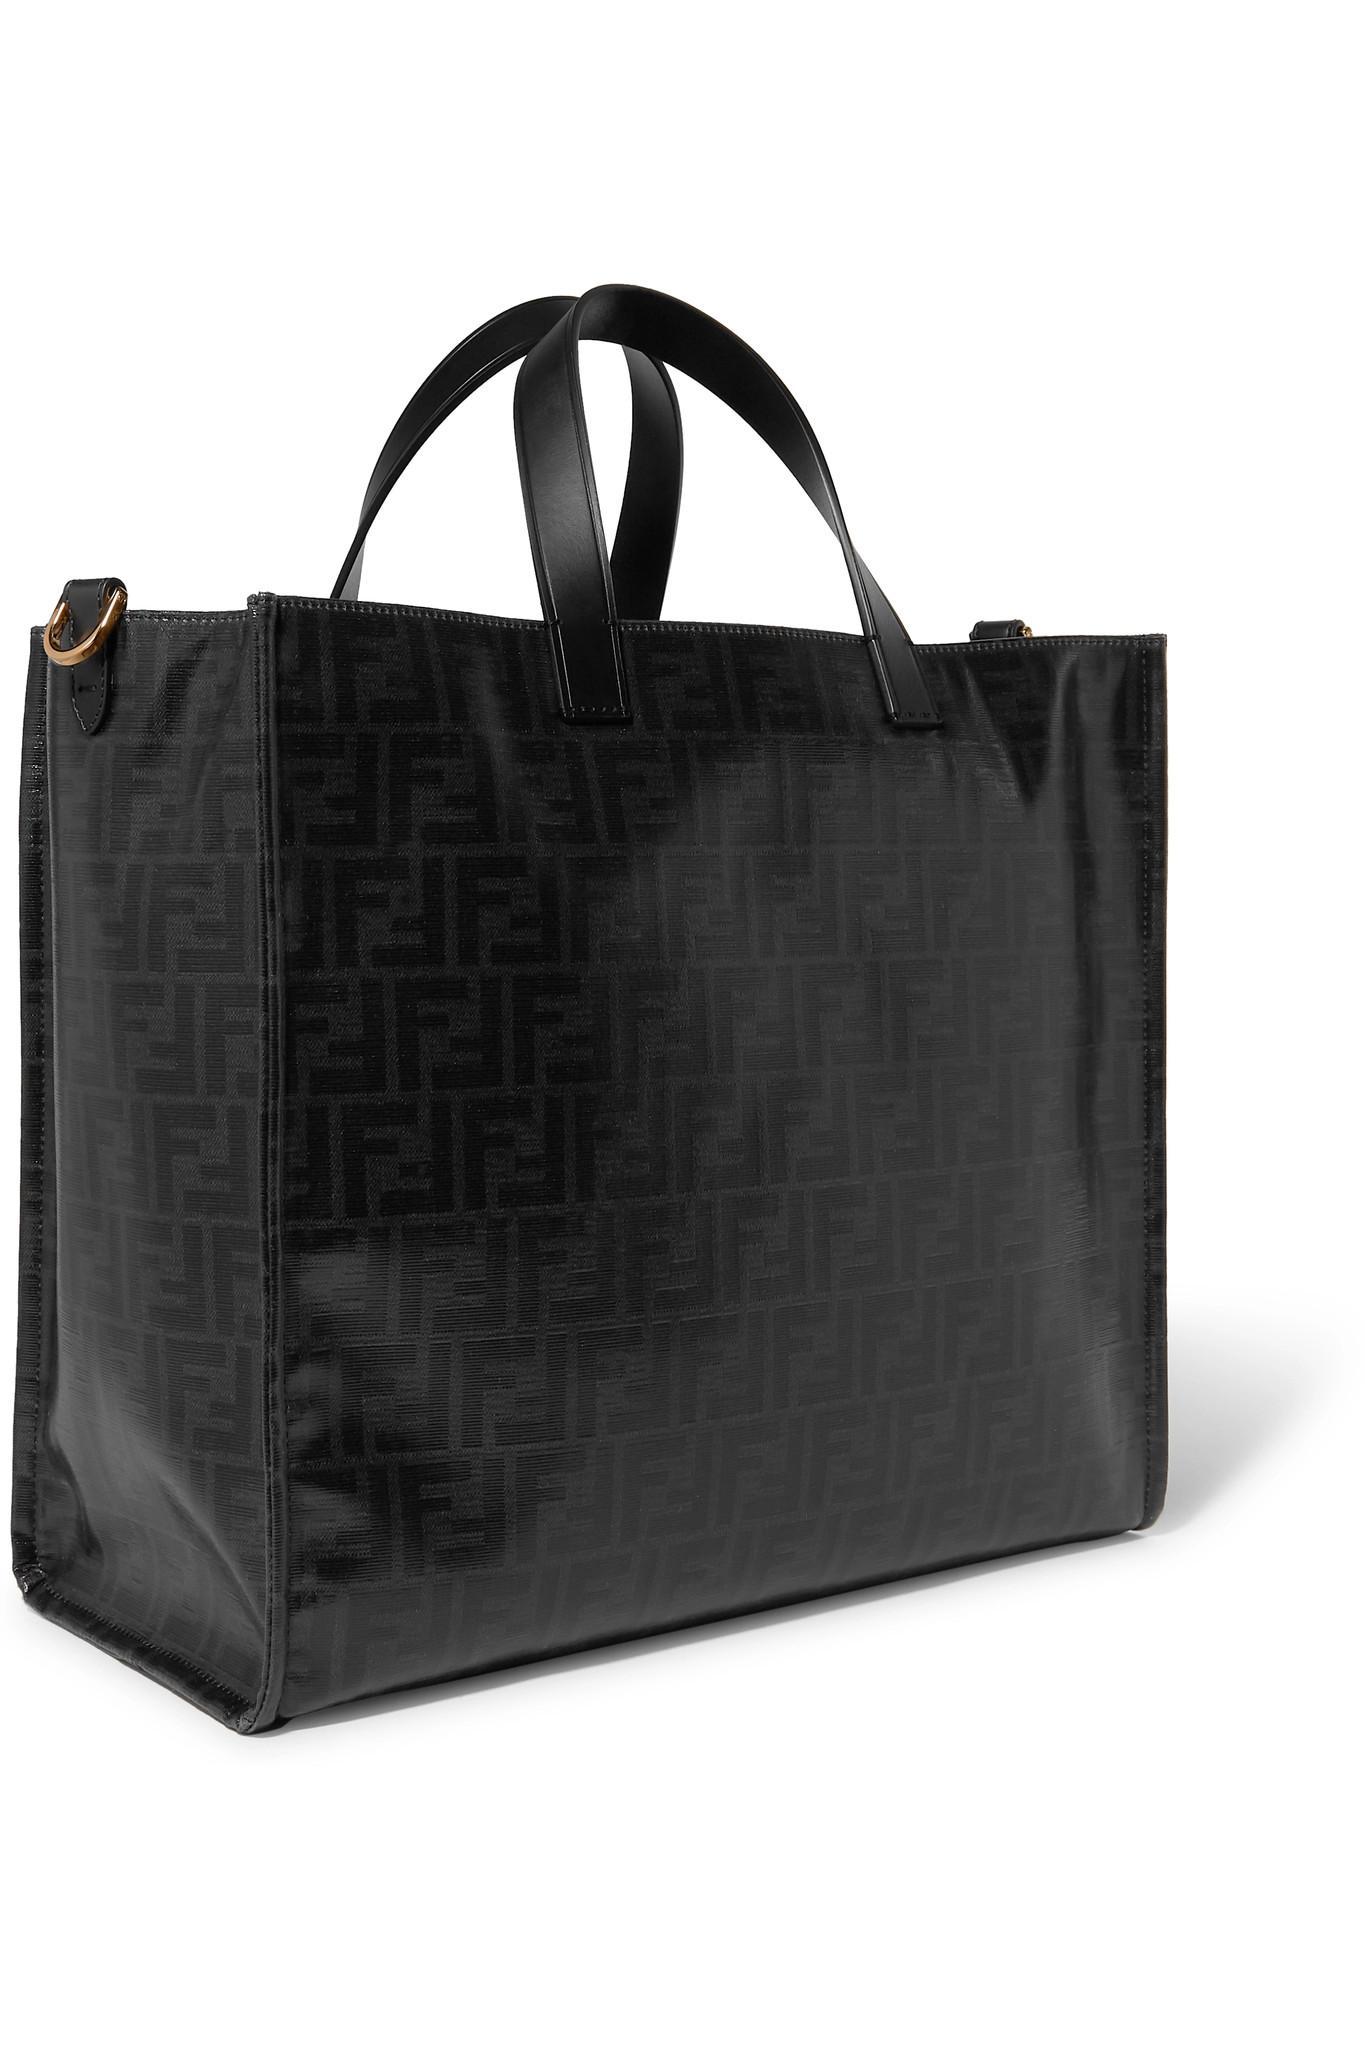 a100a771ea Fendi - Black Leather-appliquéd Coated-canvas Tote - Lyst. View fullscreen